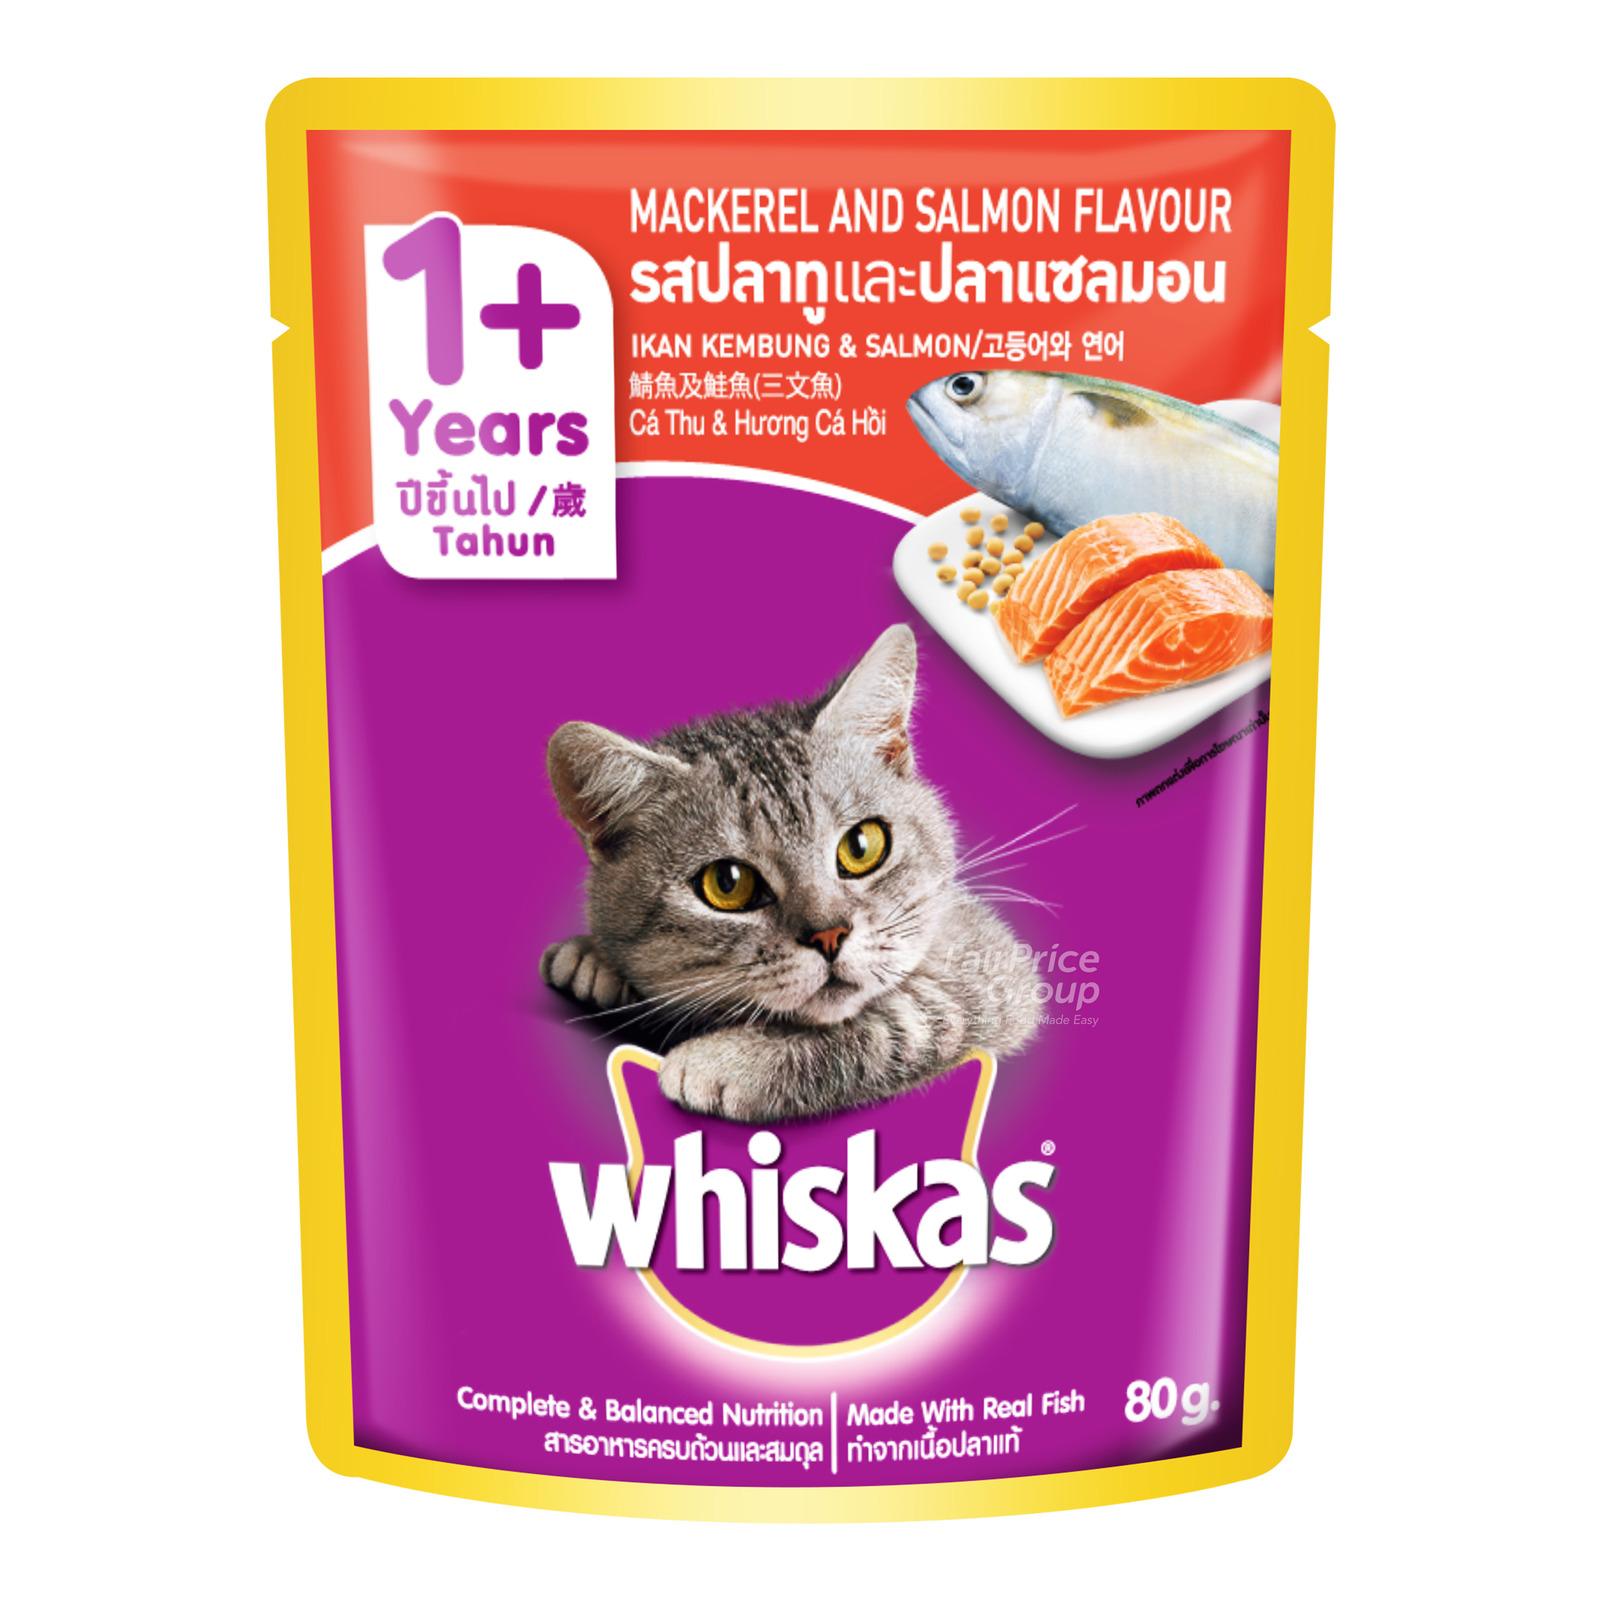 Whiskas Pouch Cat Food - Mackeral & Salmon